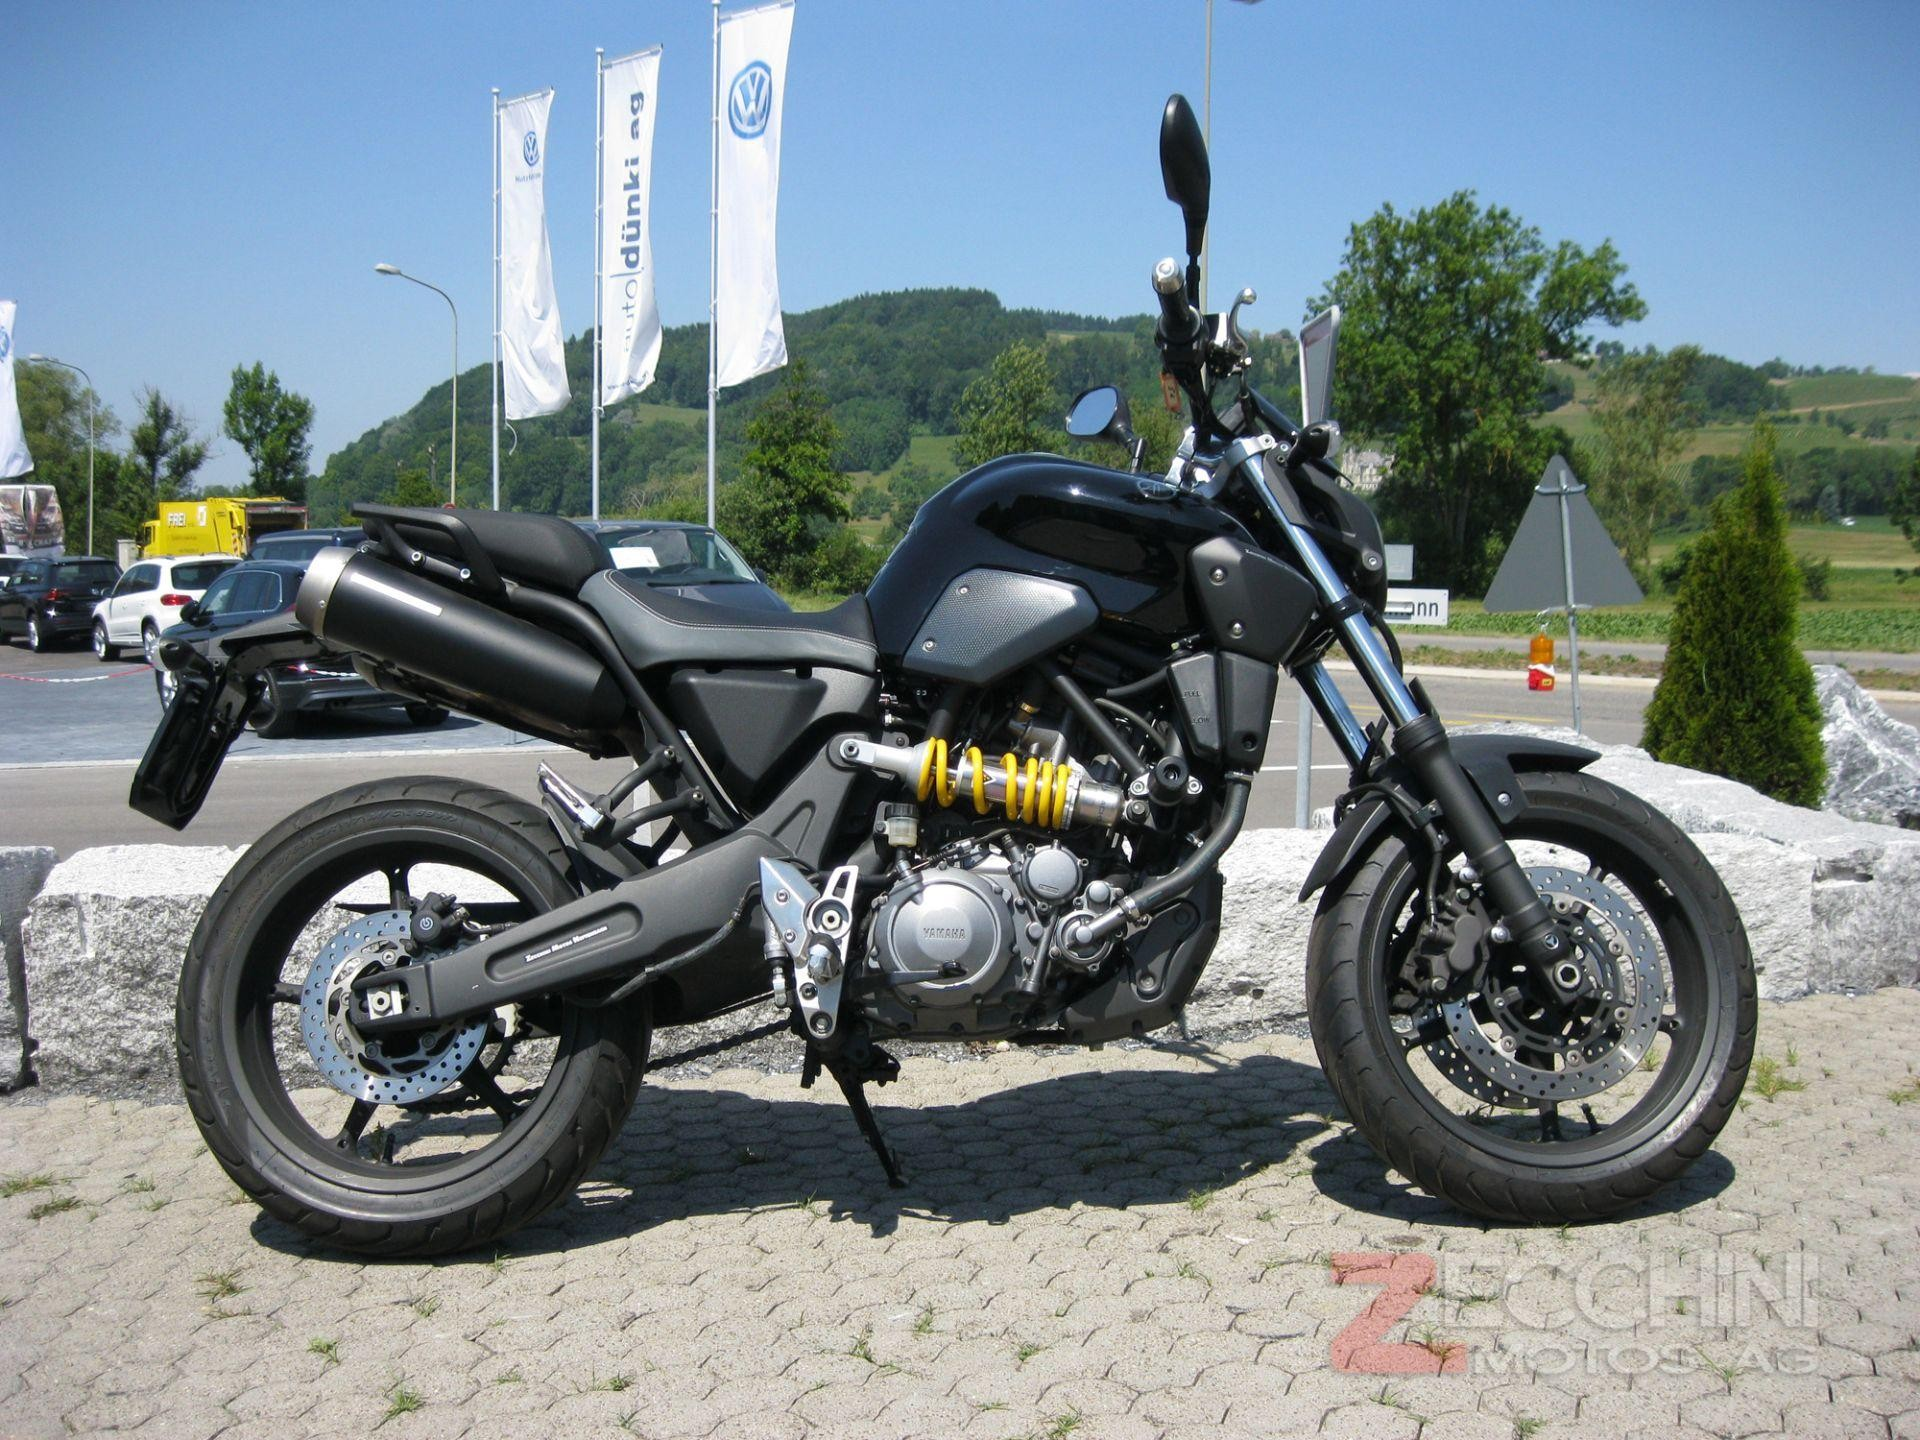 moto occasions acheter yamaha mt 03 zecchini motos ag neftenbach. Black Bedroom Furniture Sets. Home Design Ideas